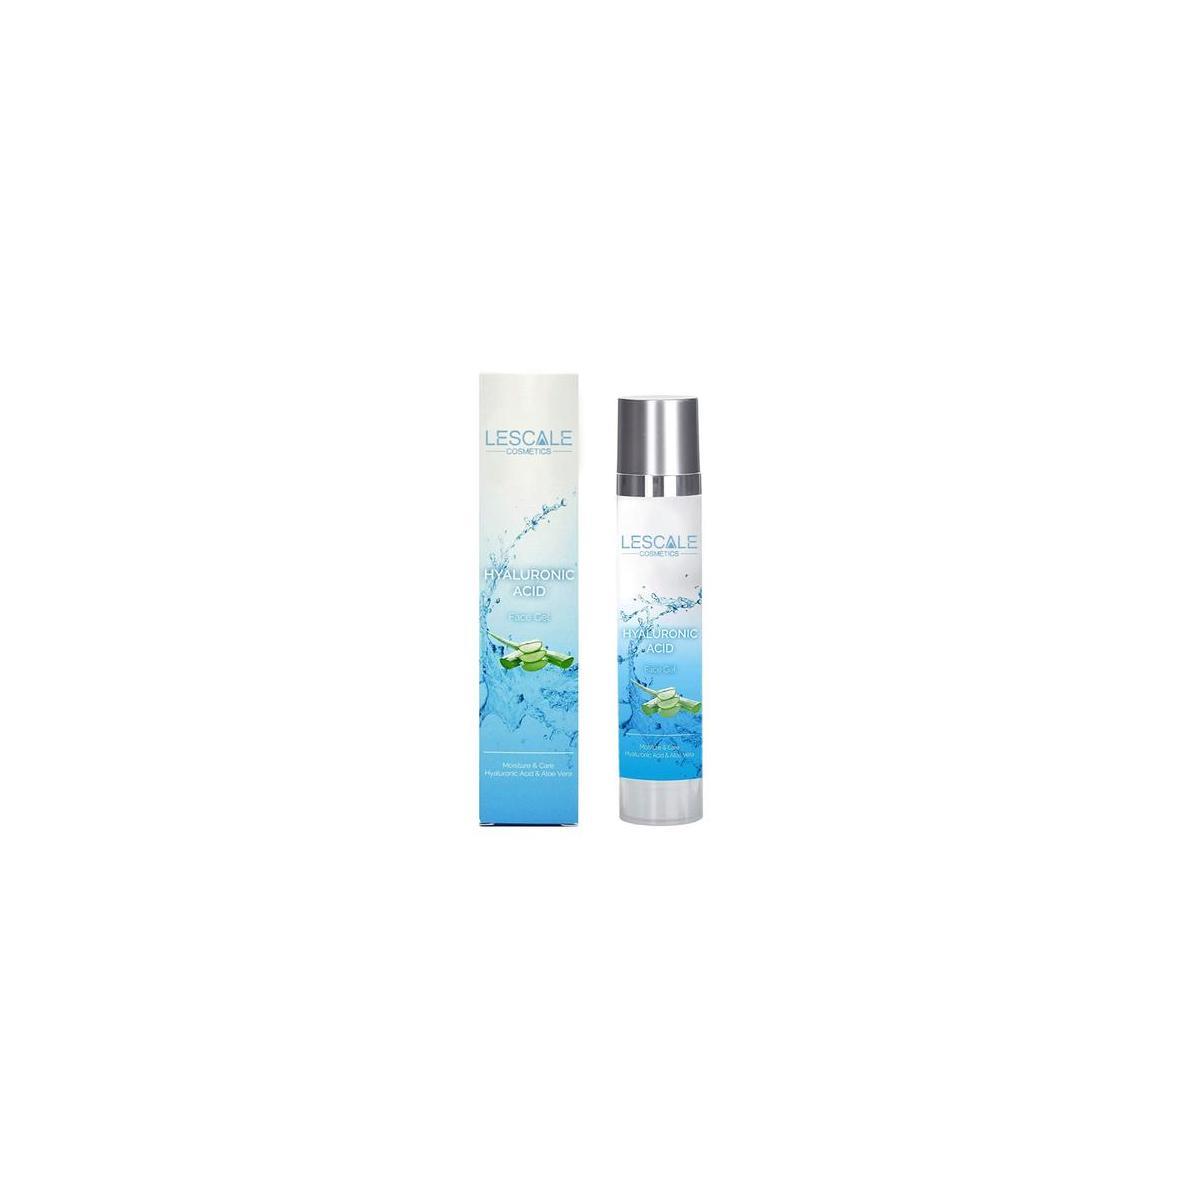 Hyaluronic Acid Gel with Aloe Vera, 50 ml